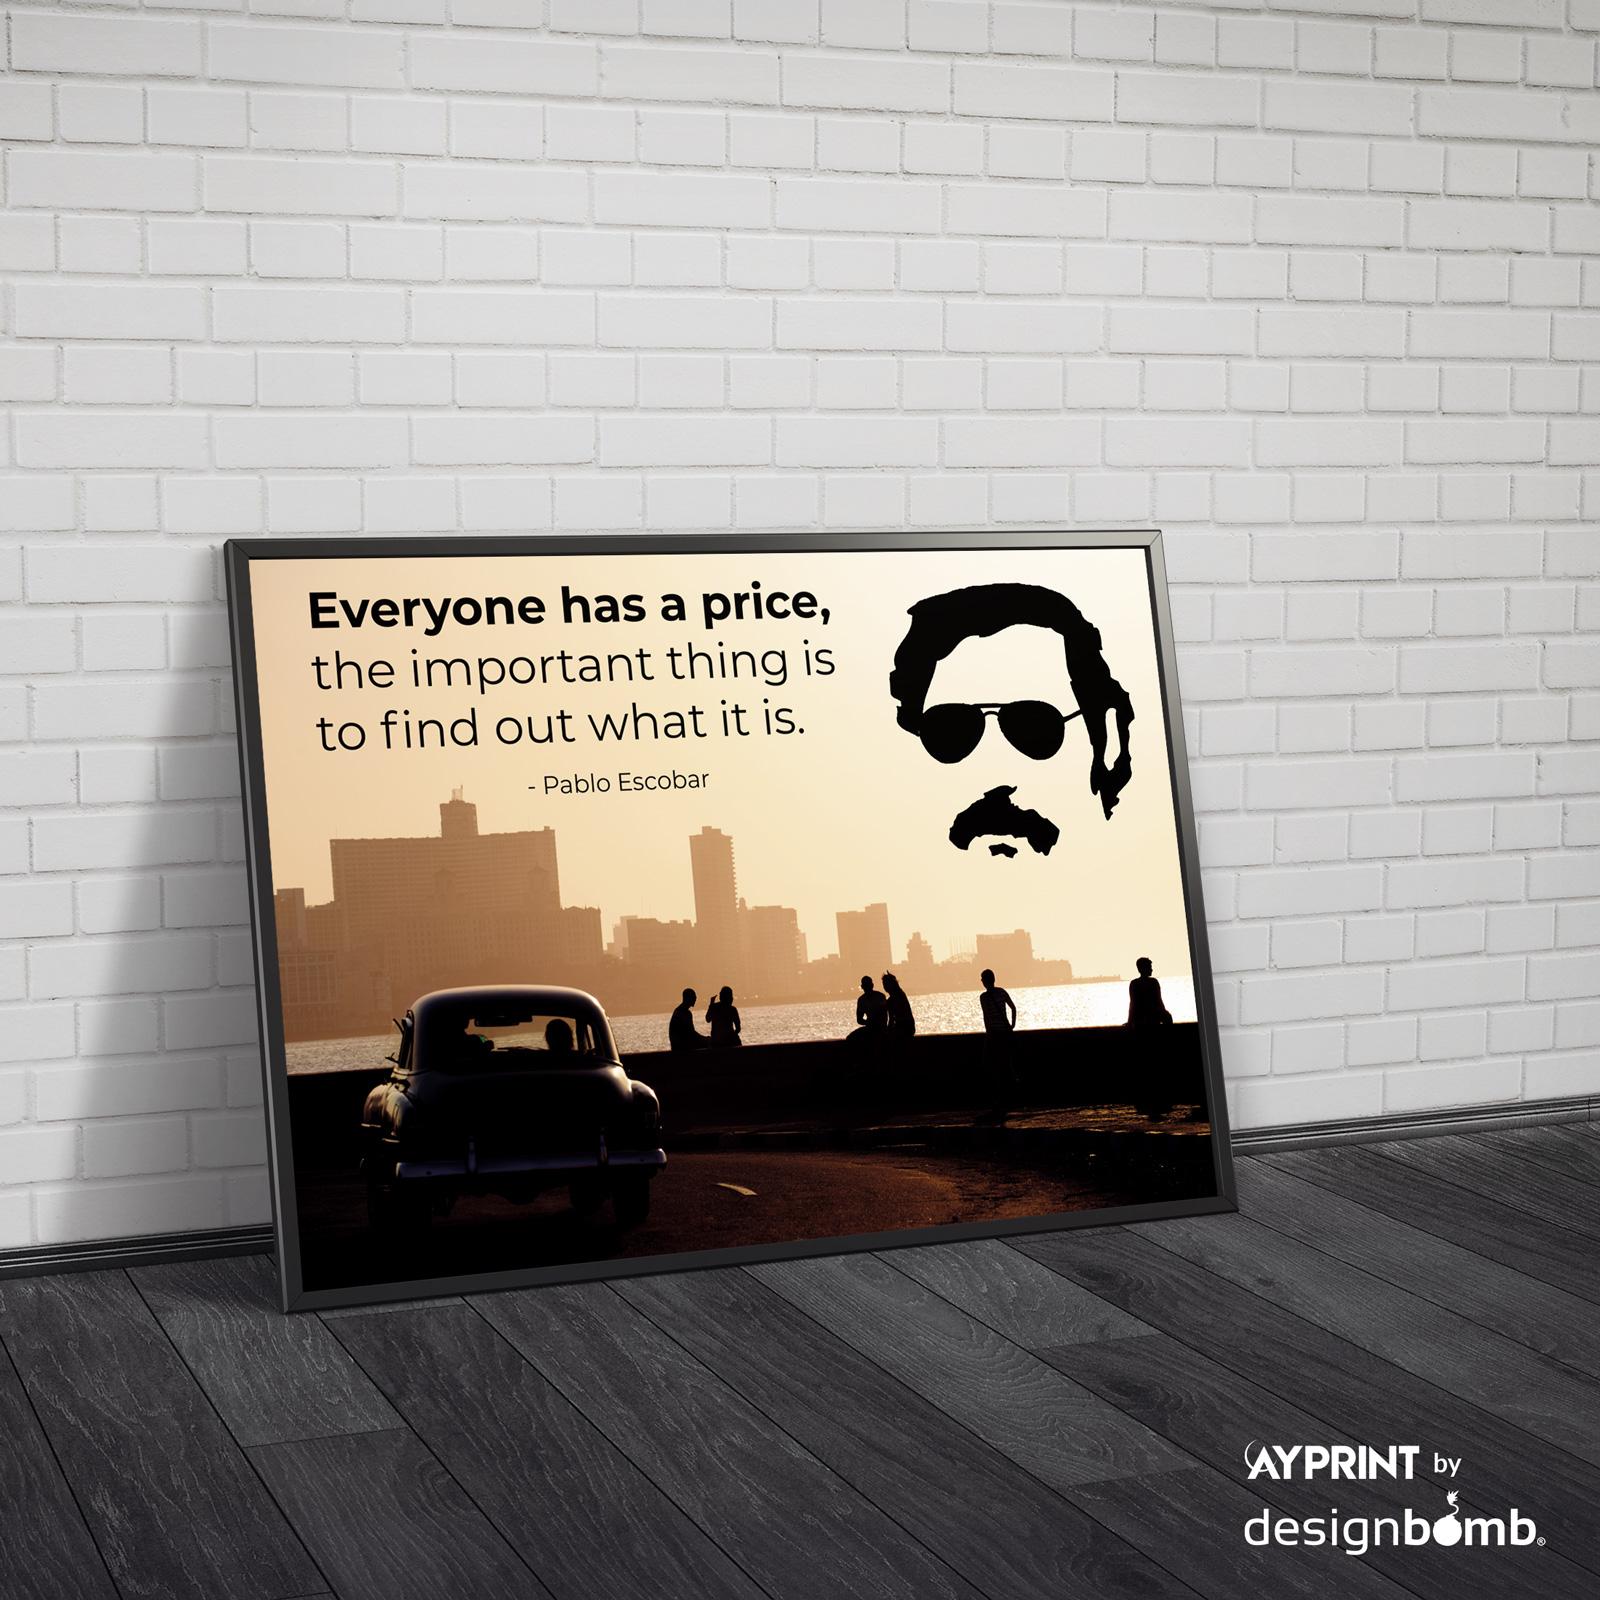 Details Zu Designbomb Pablo Escobar Everyone Has A Price Spruch Zitat Poster Fotoplakat